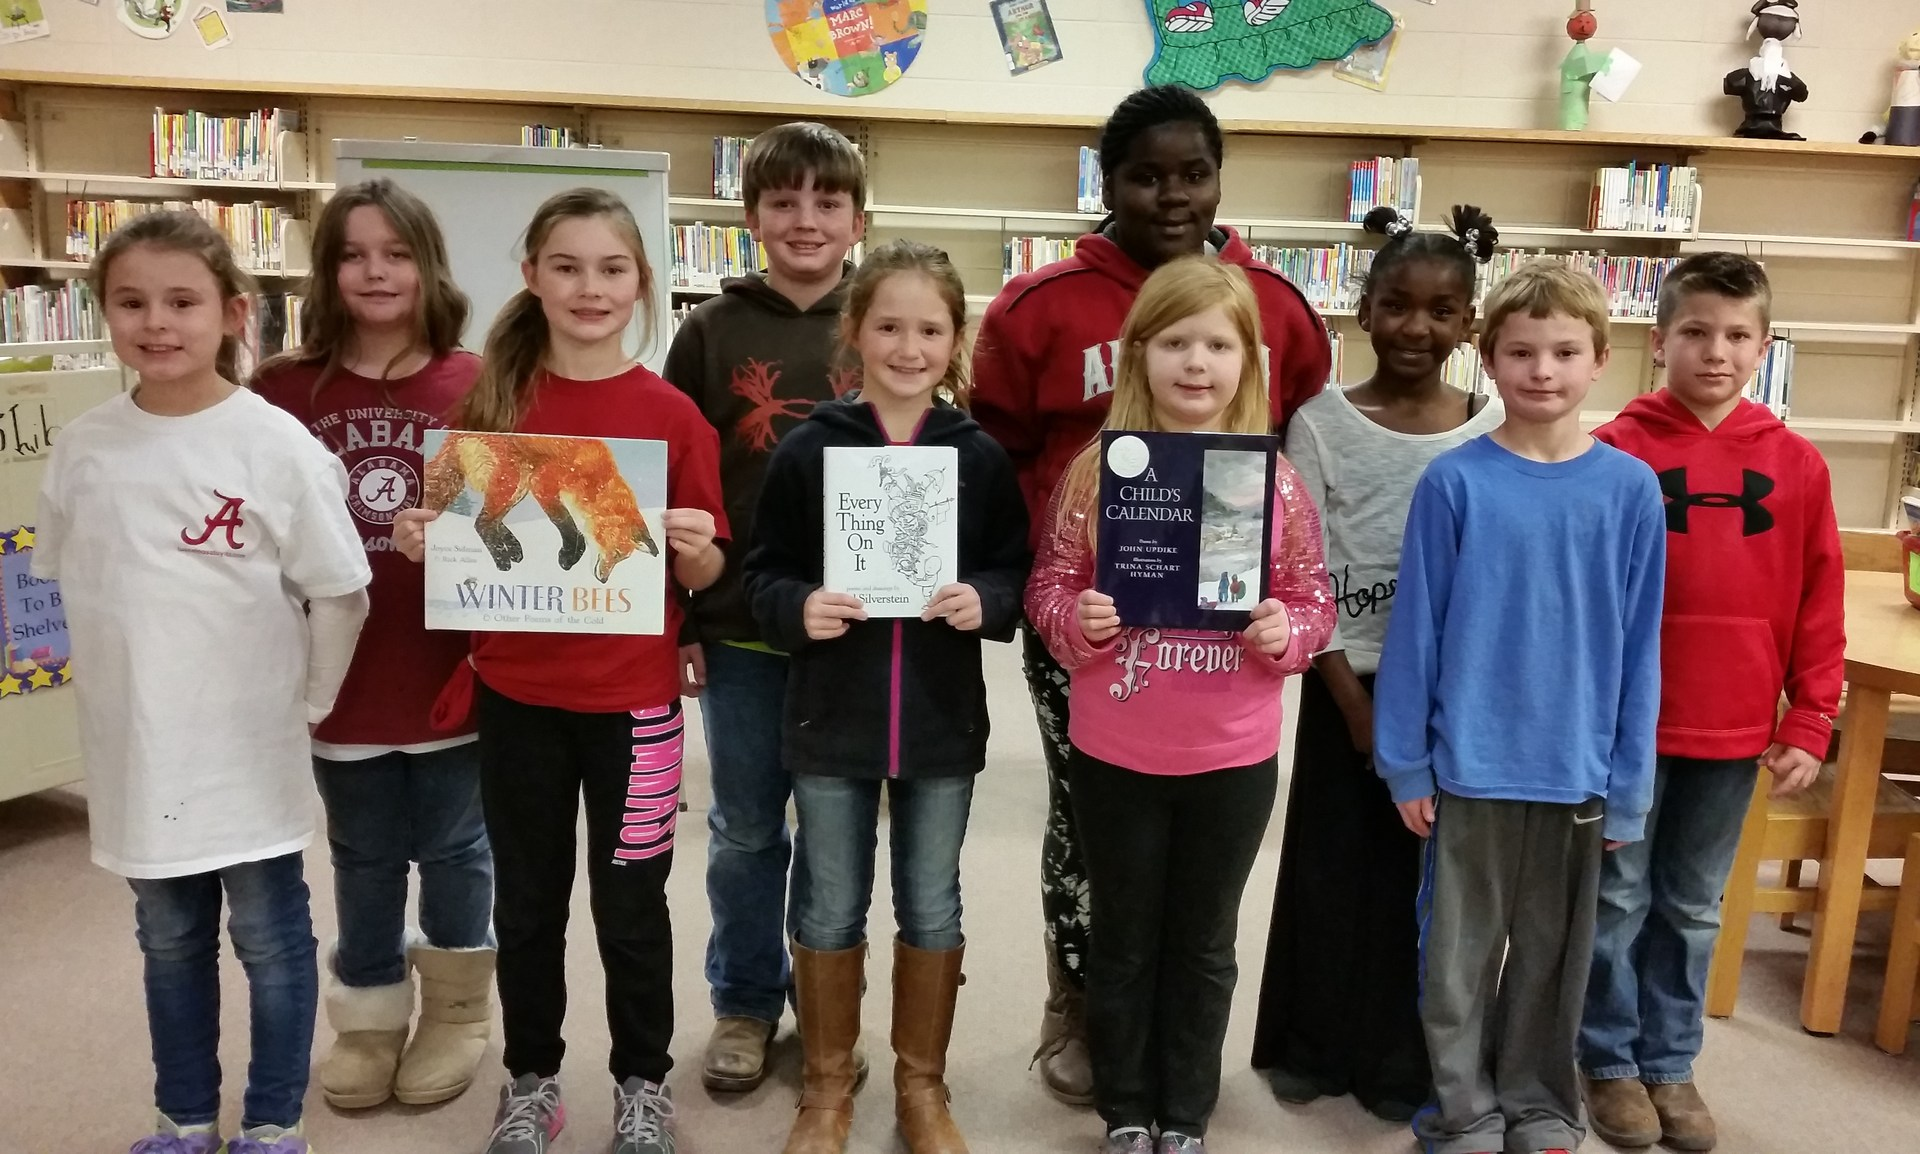 Poetry books donated in honor of former BES teacher, Karen Compere.